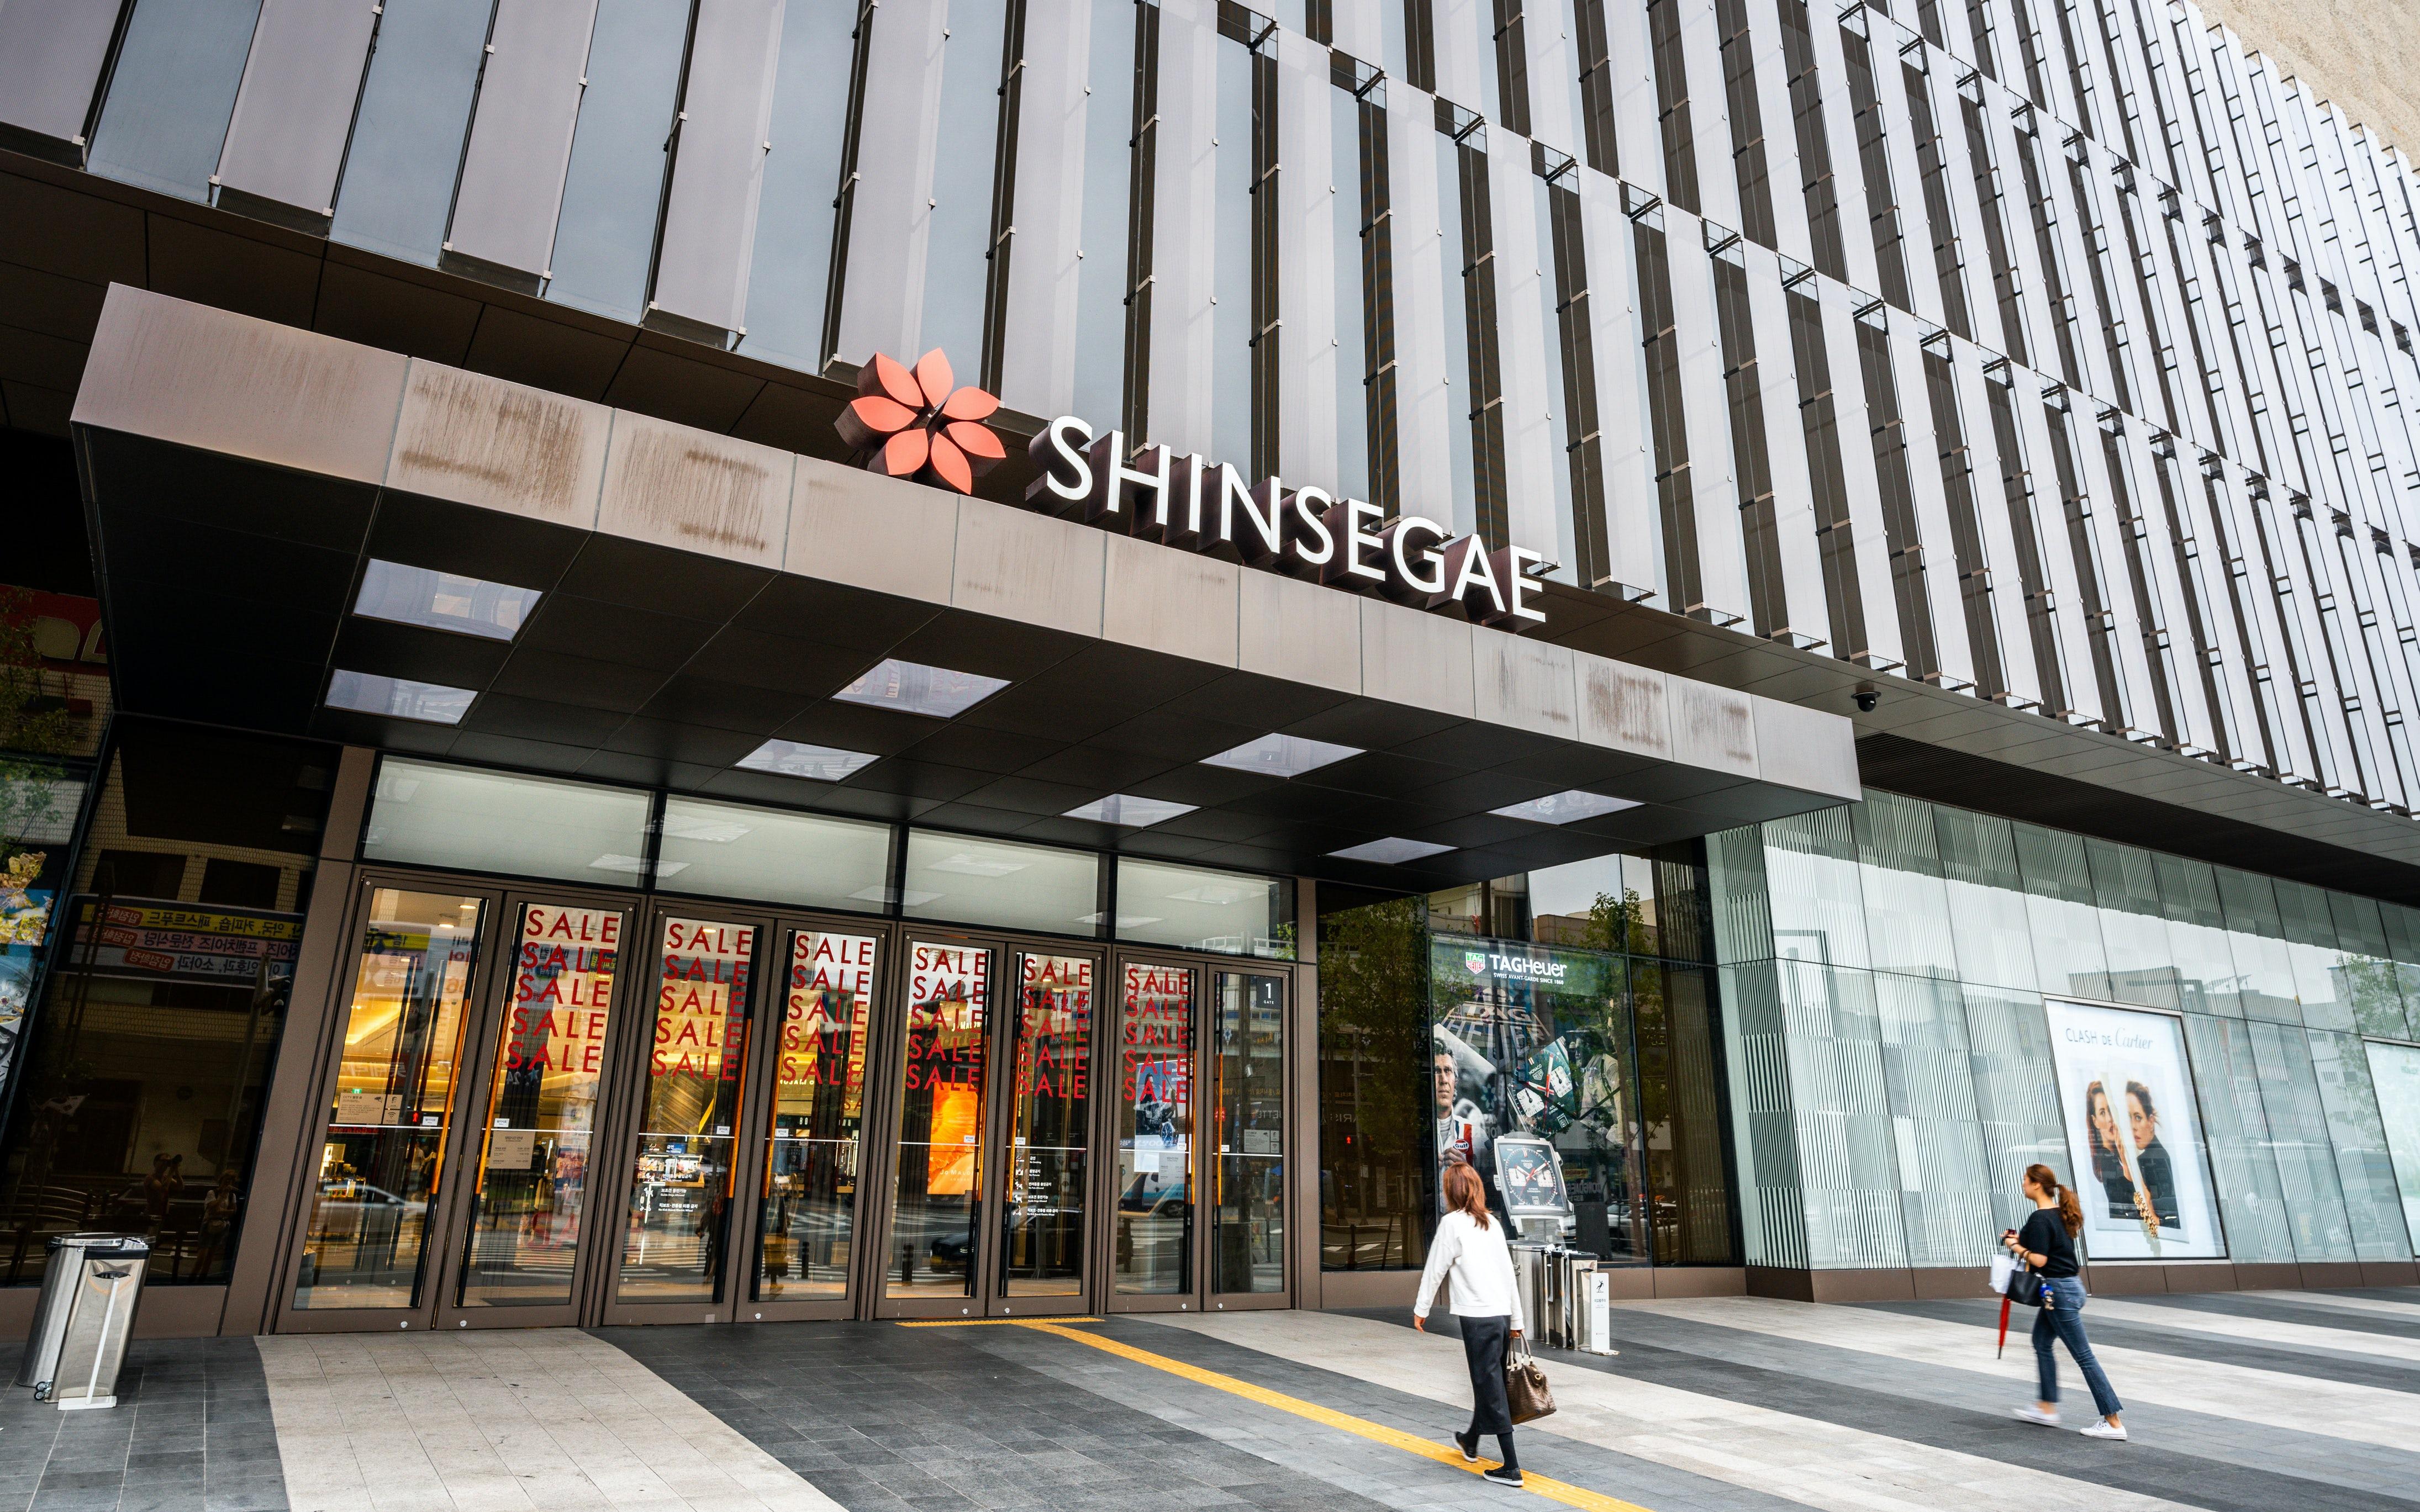 Outside a Shinsegae department store in Daegu, South Korea. Shutterstock.